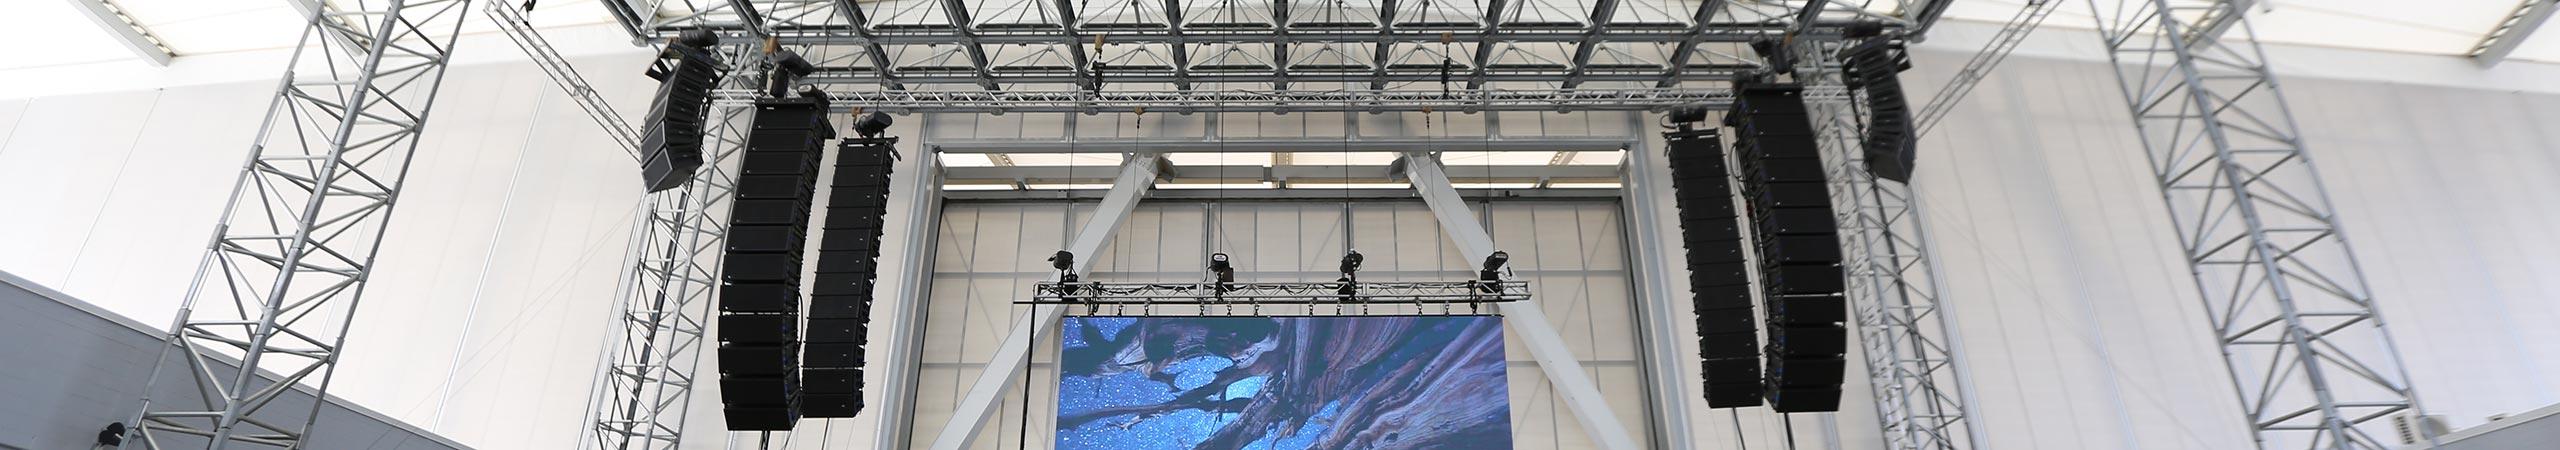 Jacksonville Concert Production Sound Equipment Rental